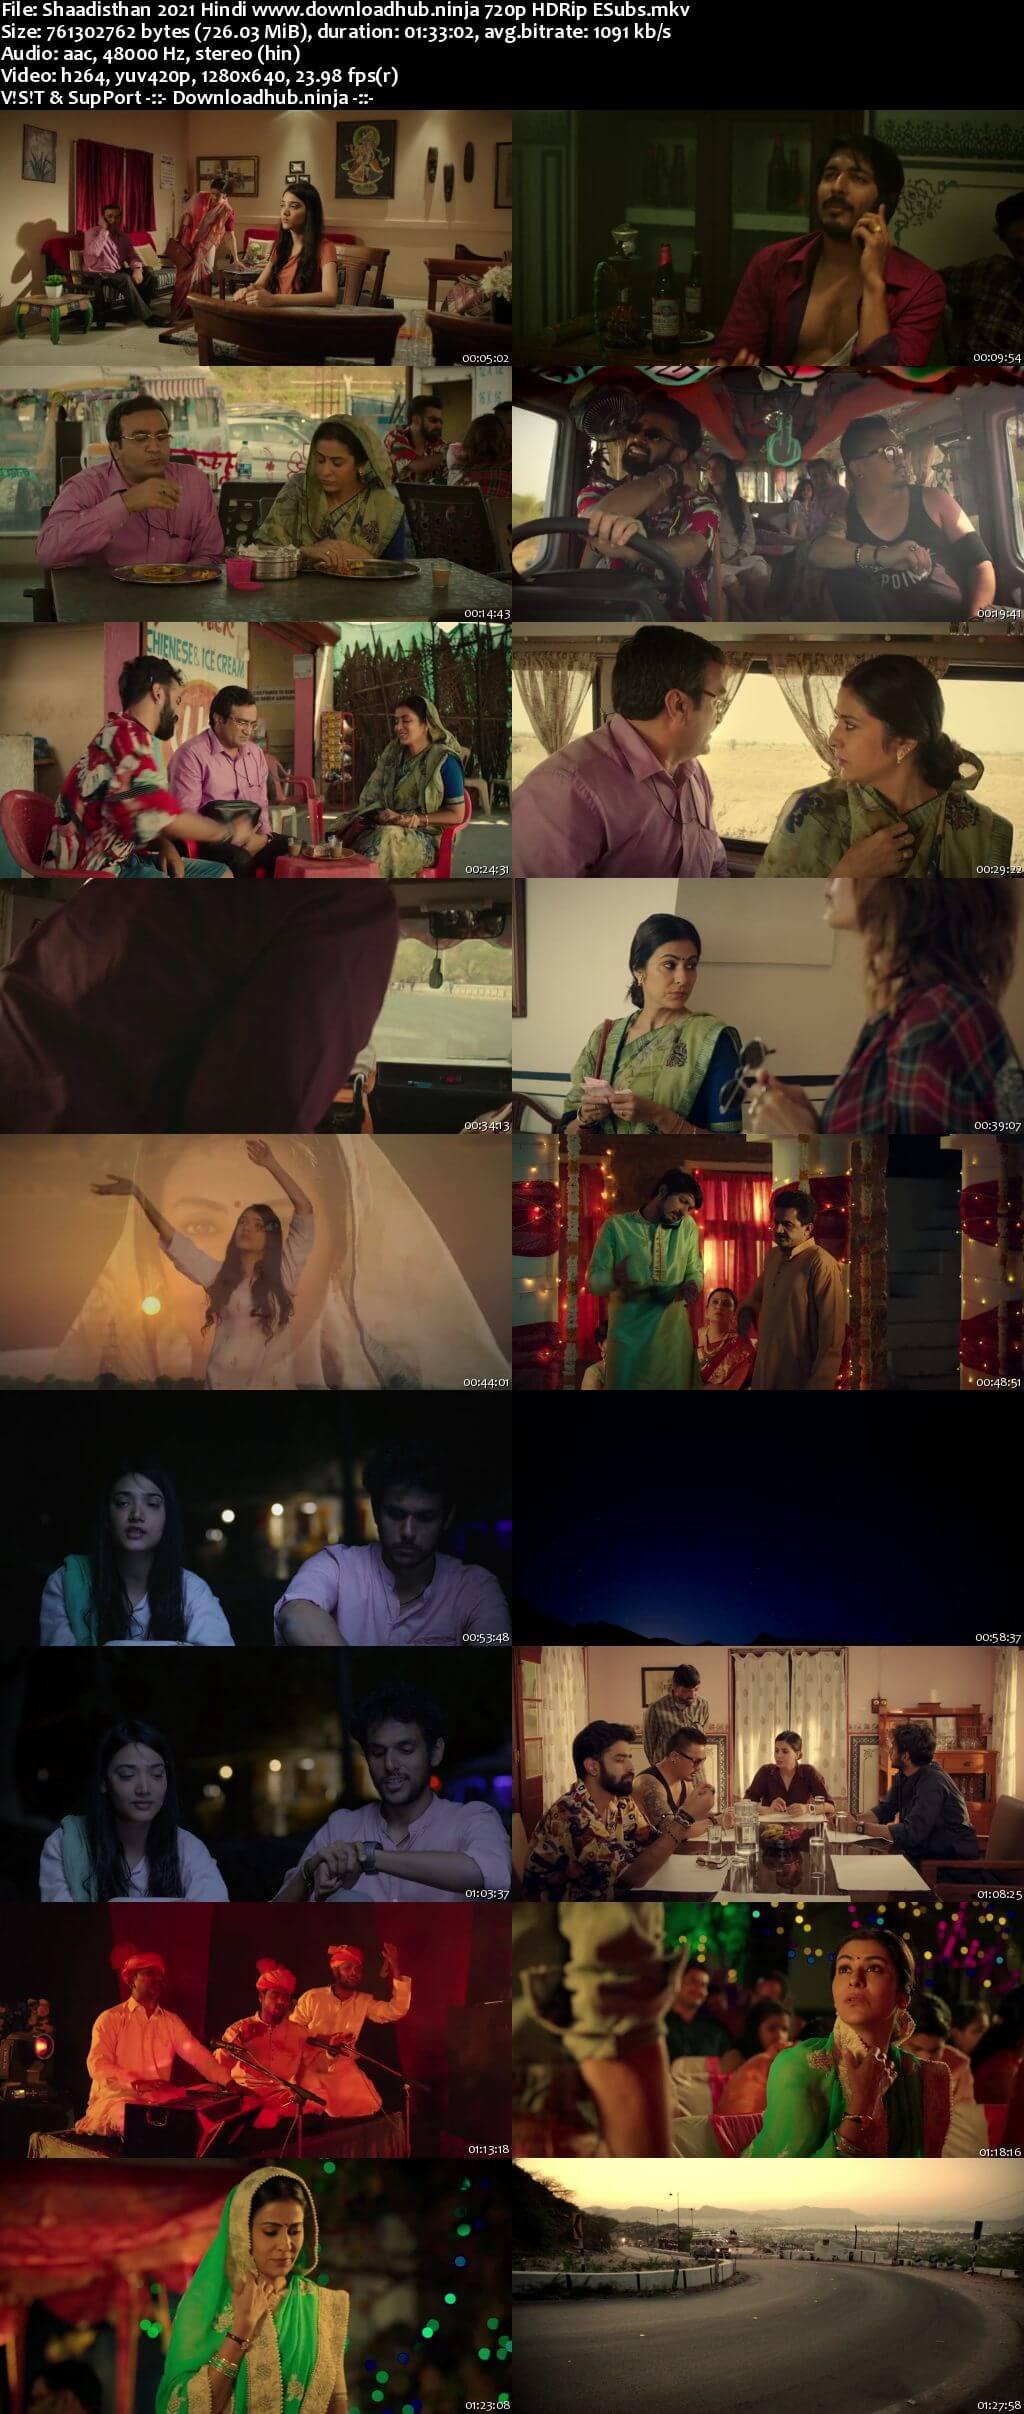 Shaadisthan 2021 Hindi 720p HDRip ESubs